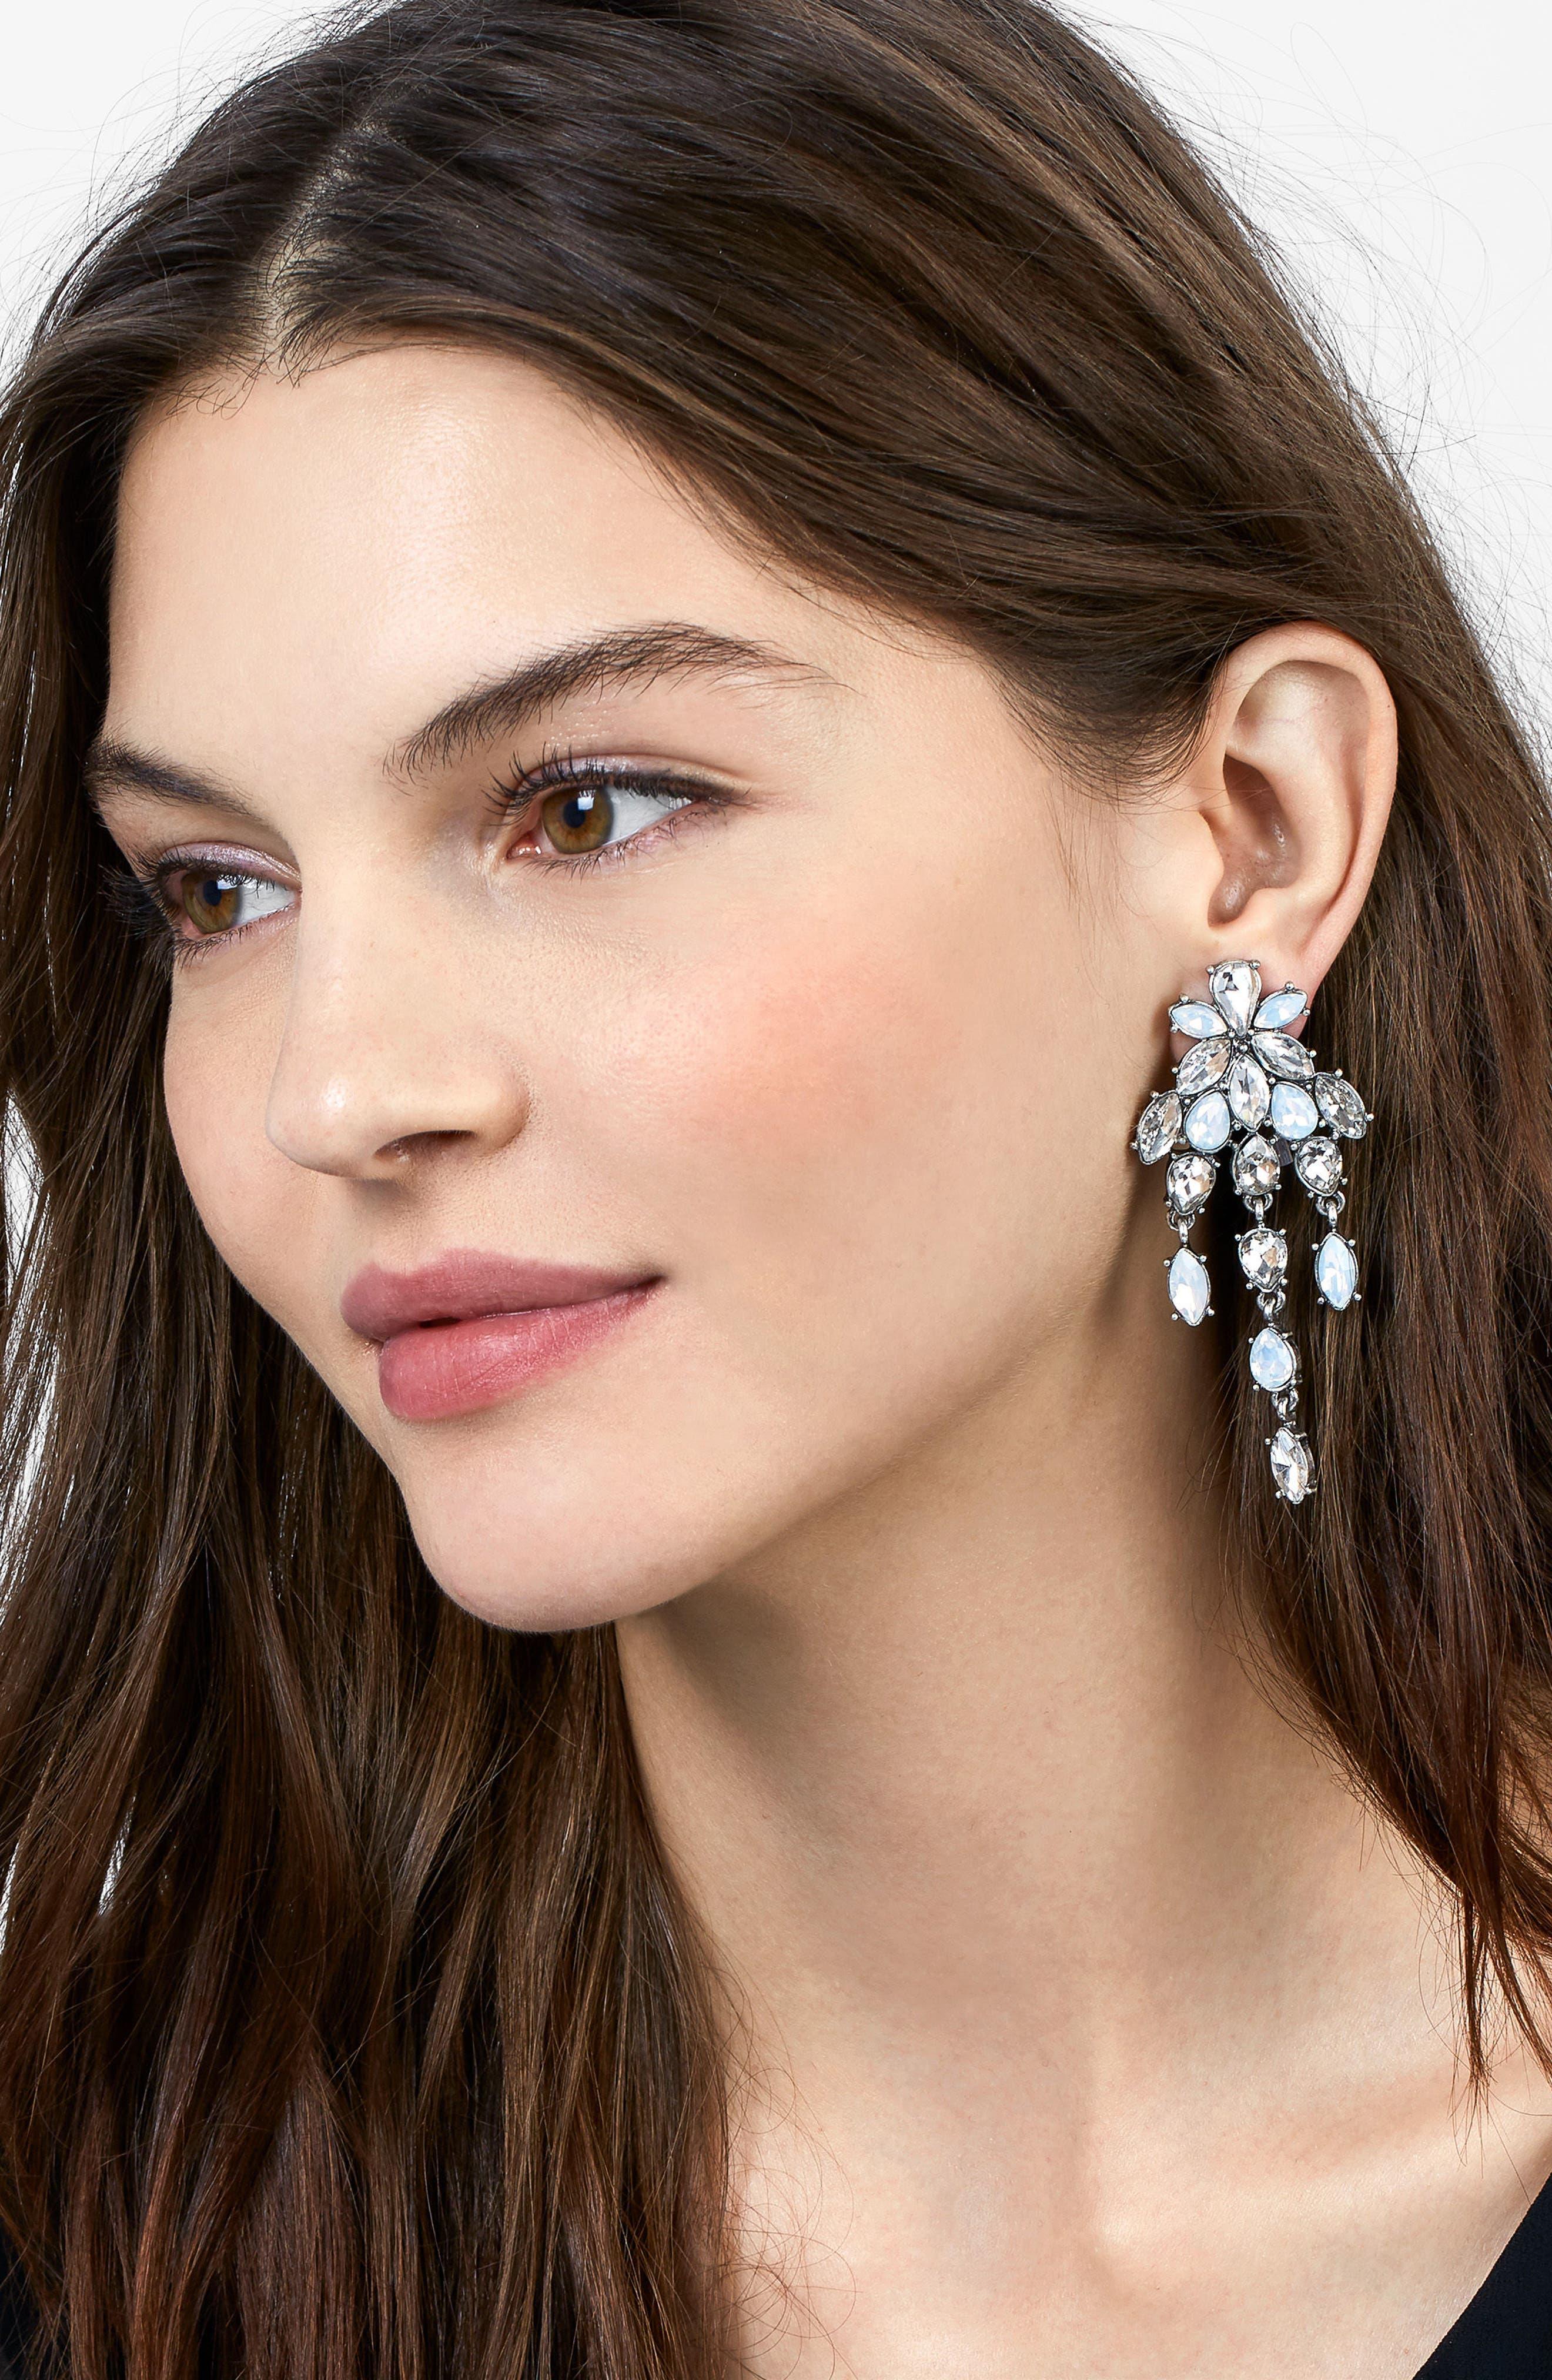 Chandelier Crystal Drop Earrings,                             Alternate thumbnail 2, color,